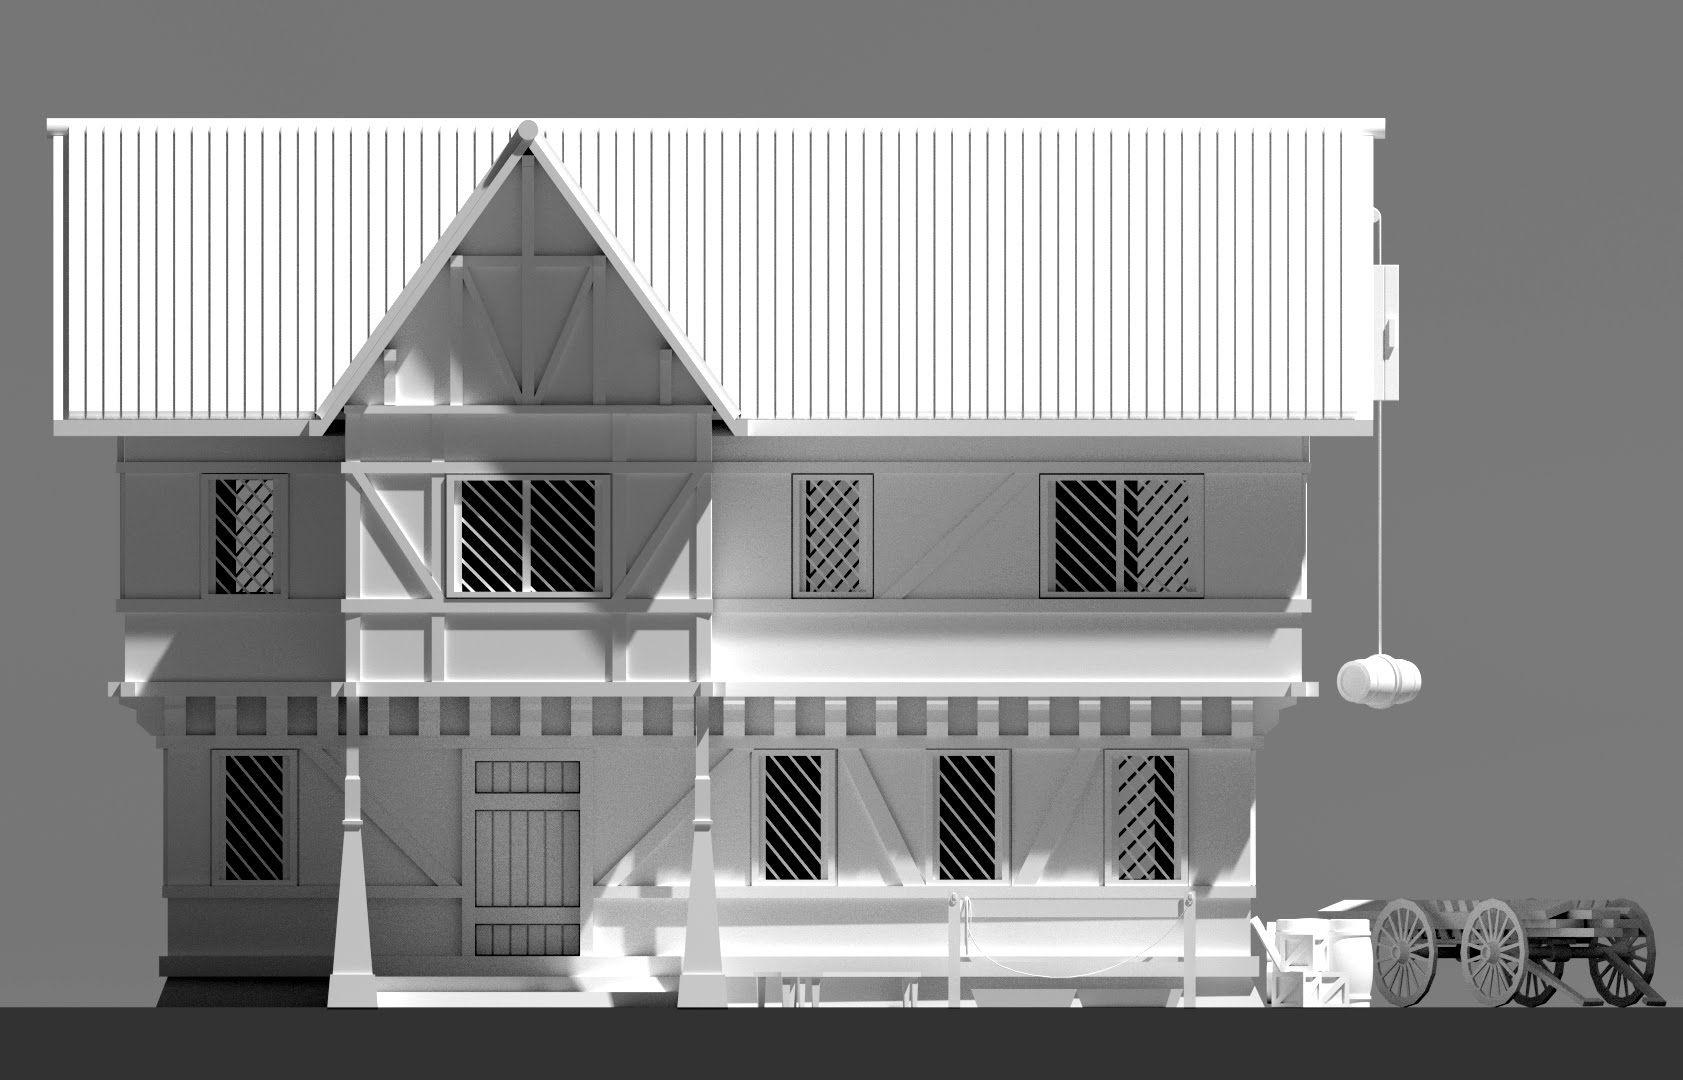 Perfect Blender 3D Speed Modeling   RPG House Exterior